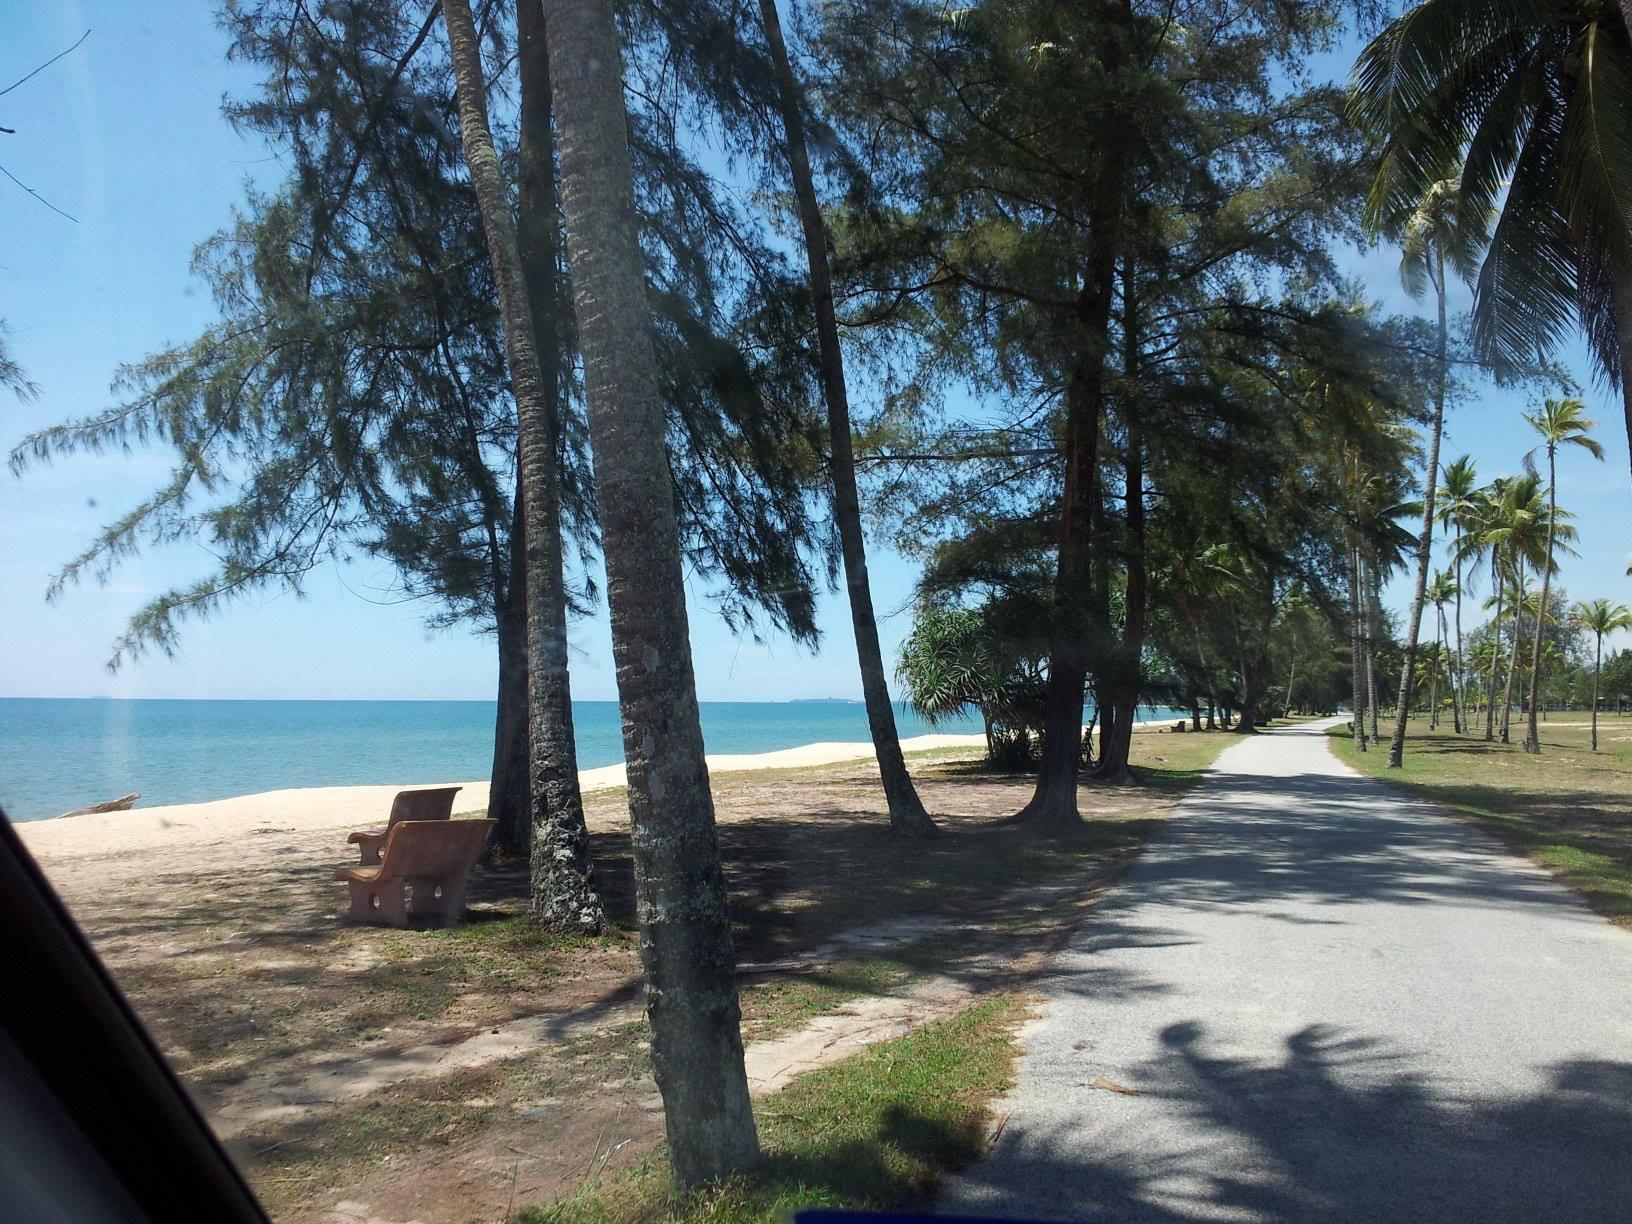 Photo courtesy of Terengganu Century Ride